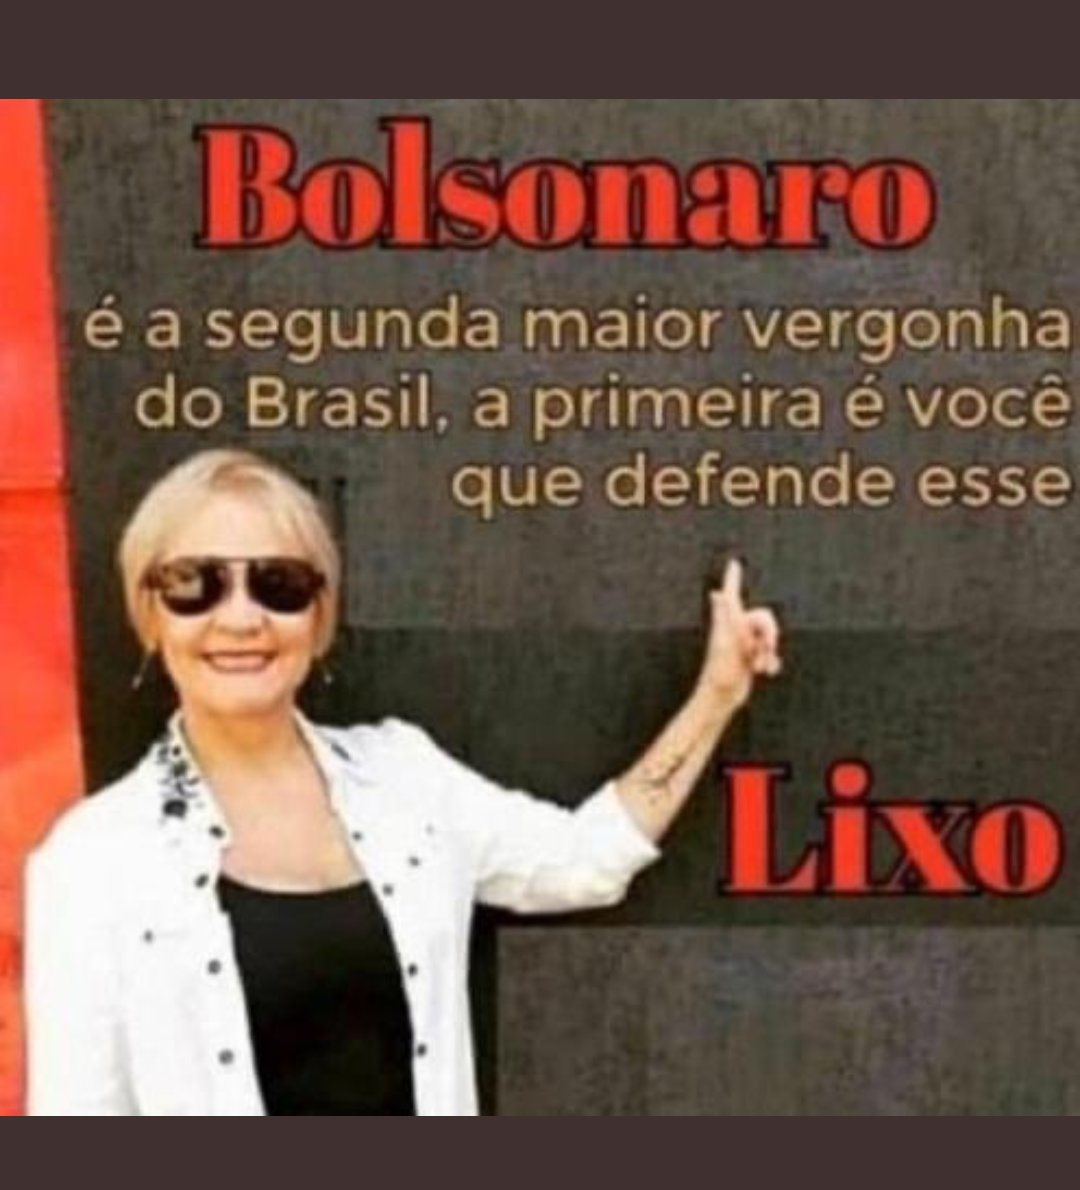 RT @iludidassso: SÓ FAV SE TIVER CORAGEM Nesse perfil odiamos o bolsonaro https://t.co/EQuOPBsV3U